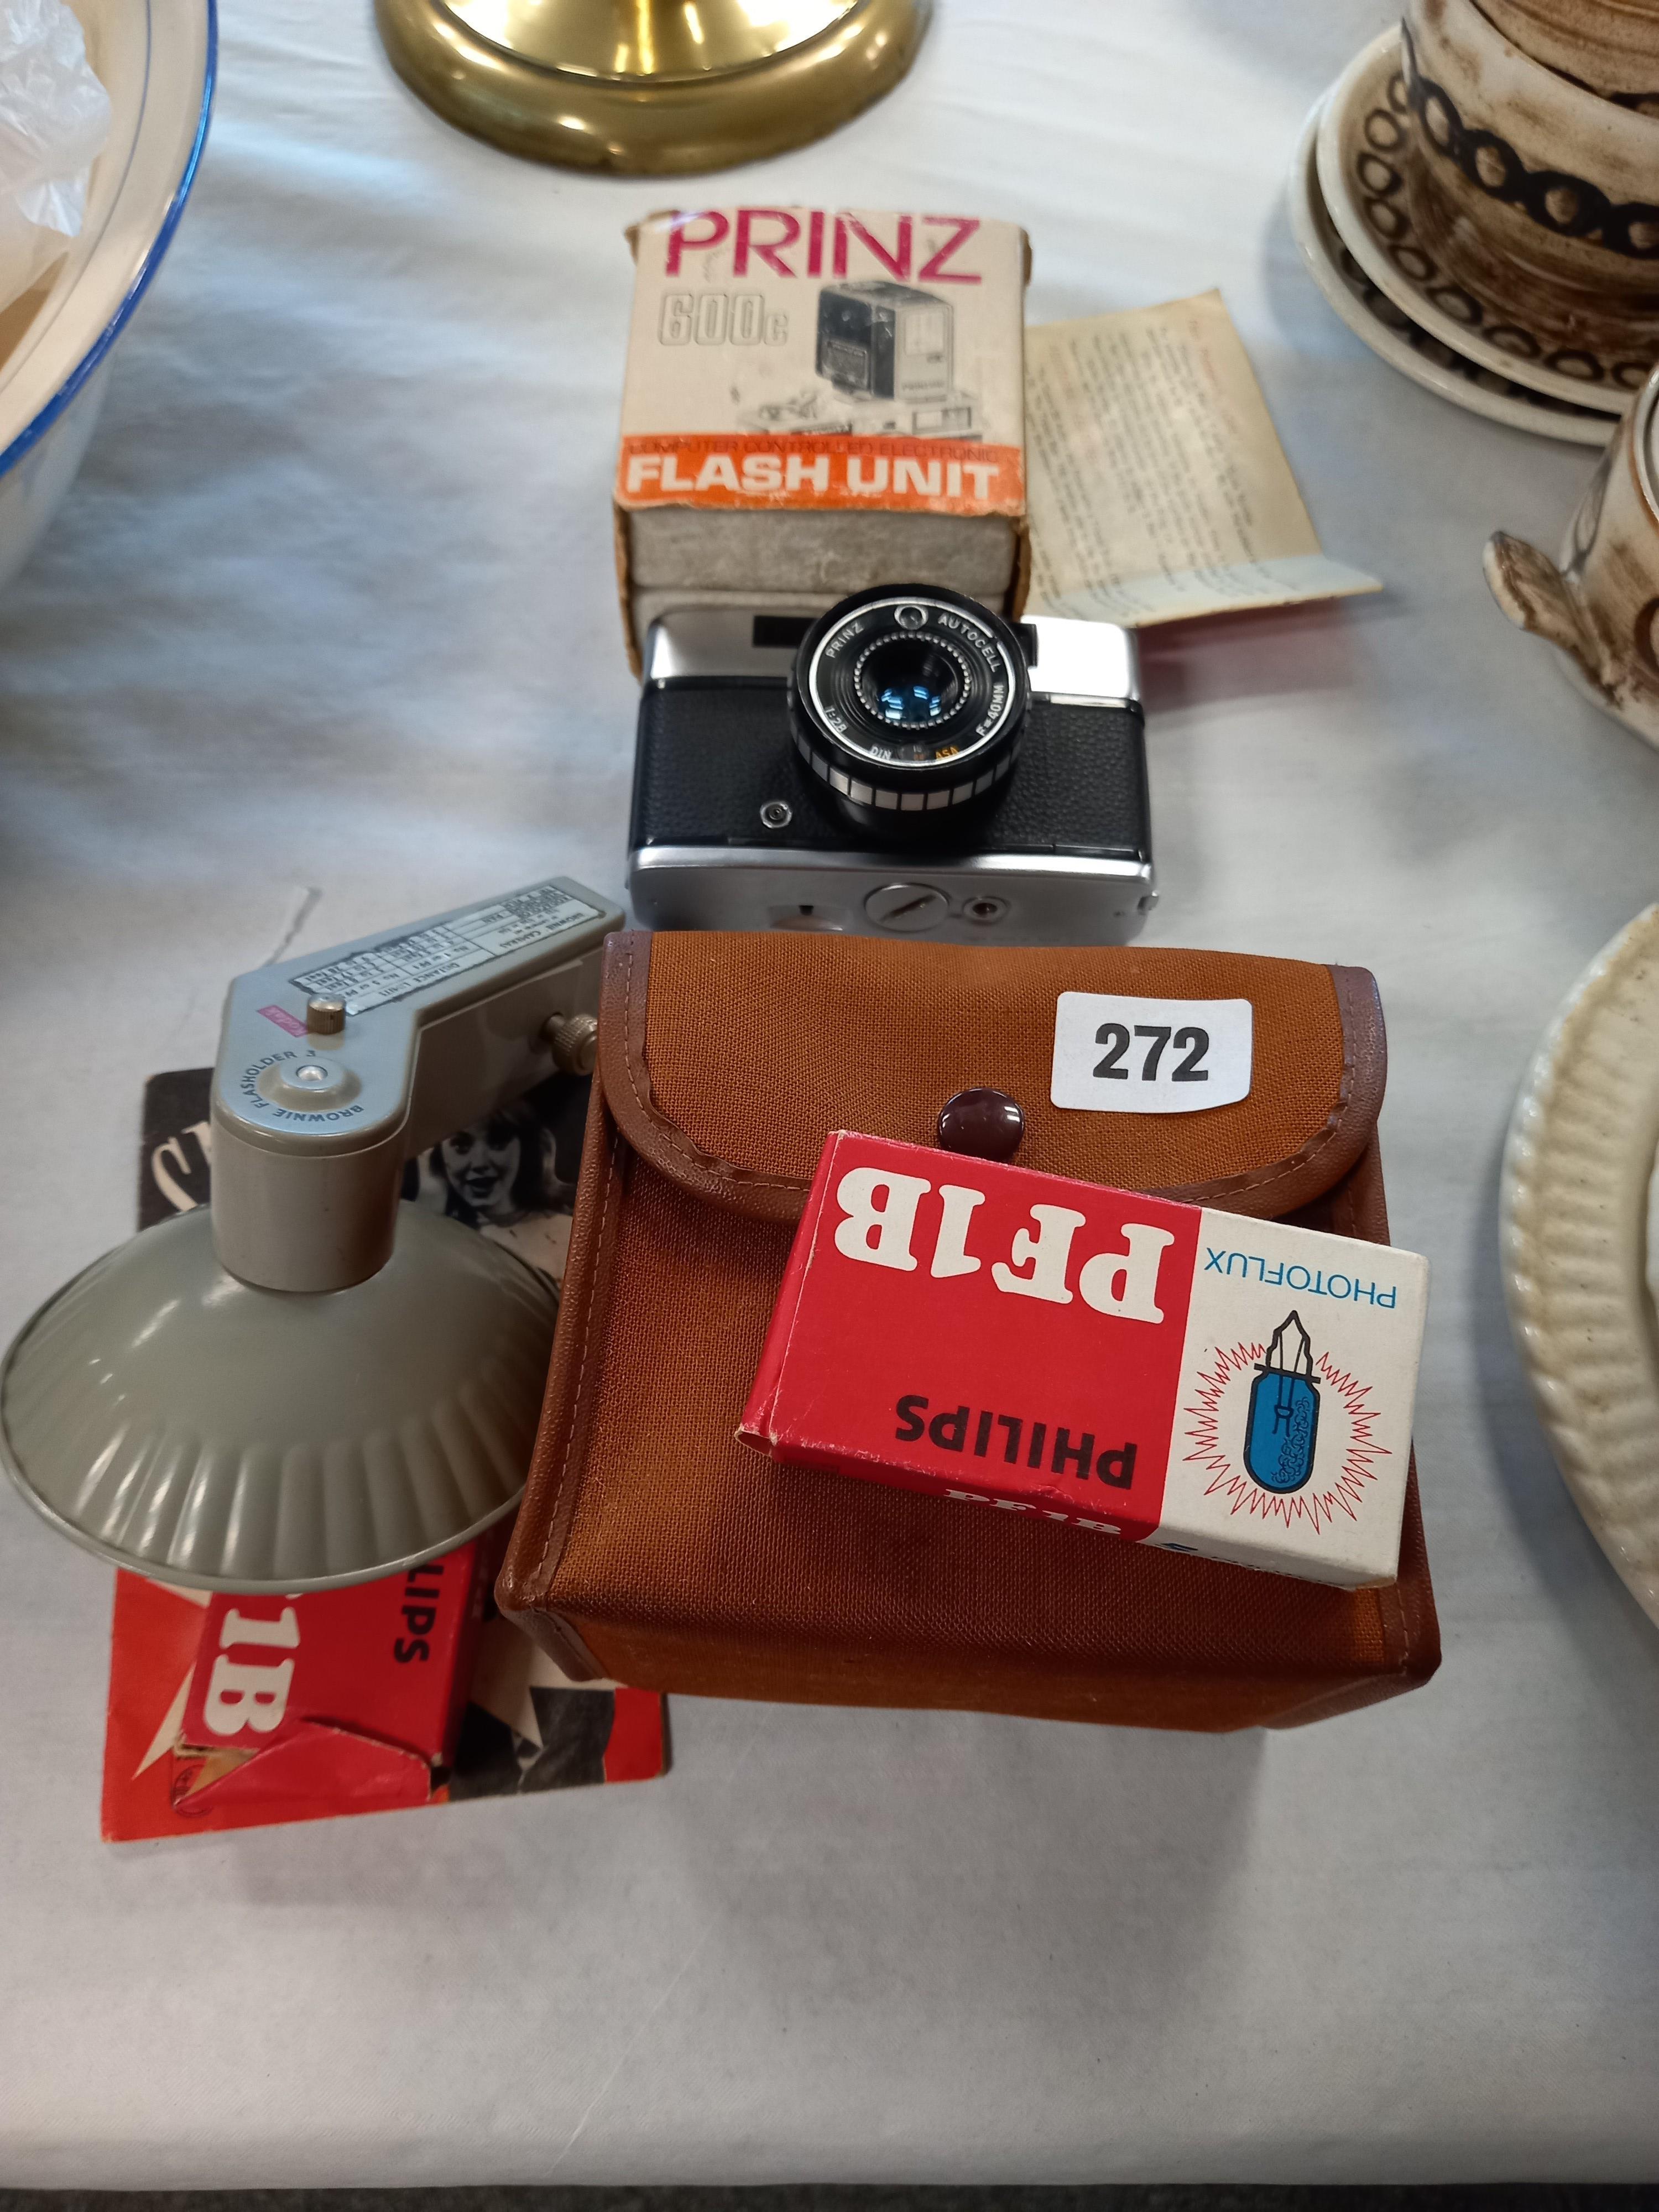 BOX BROWNIE CAMERA FLASH, PRINZ 600C